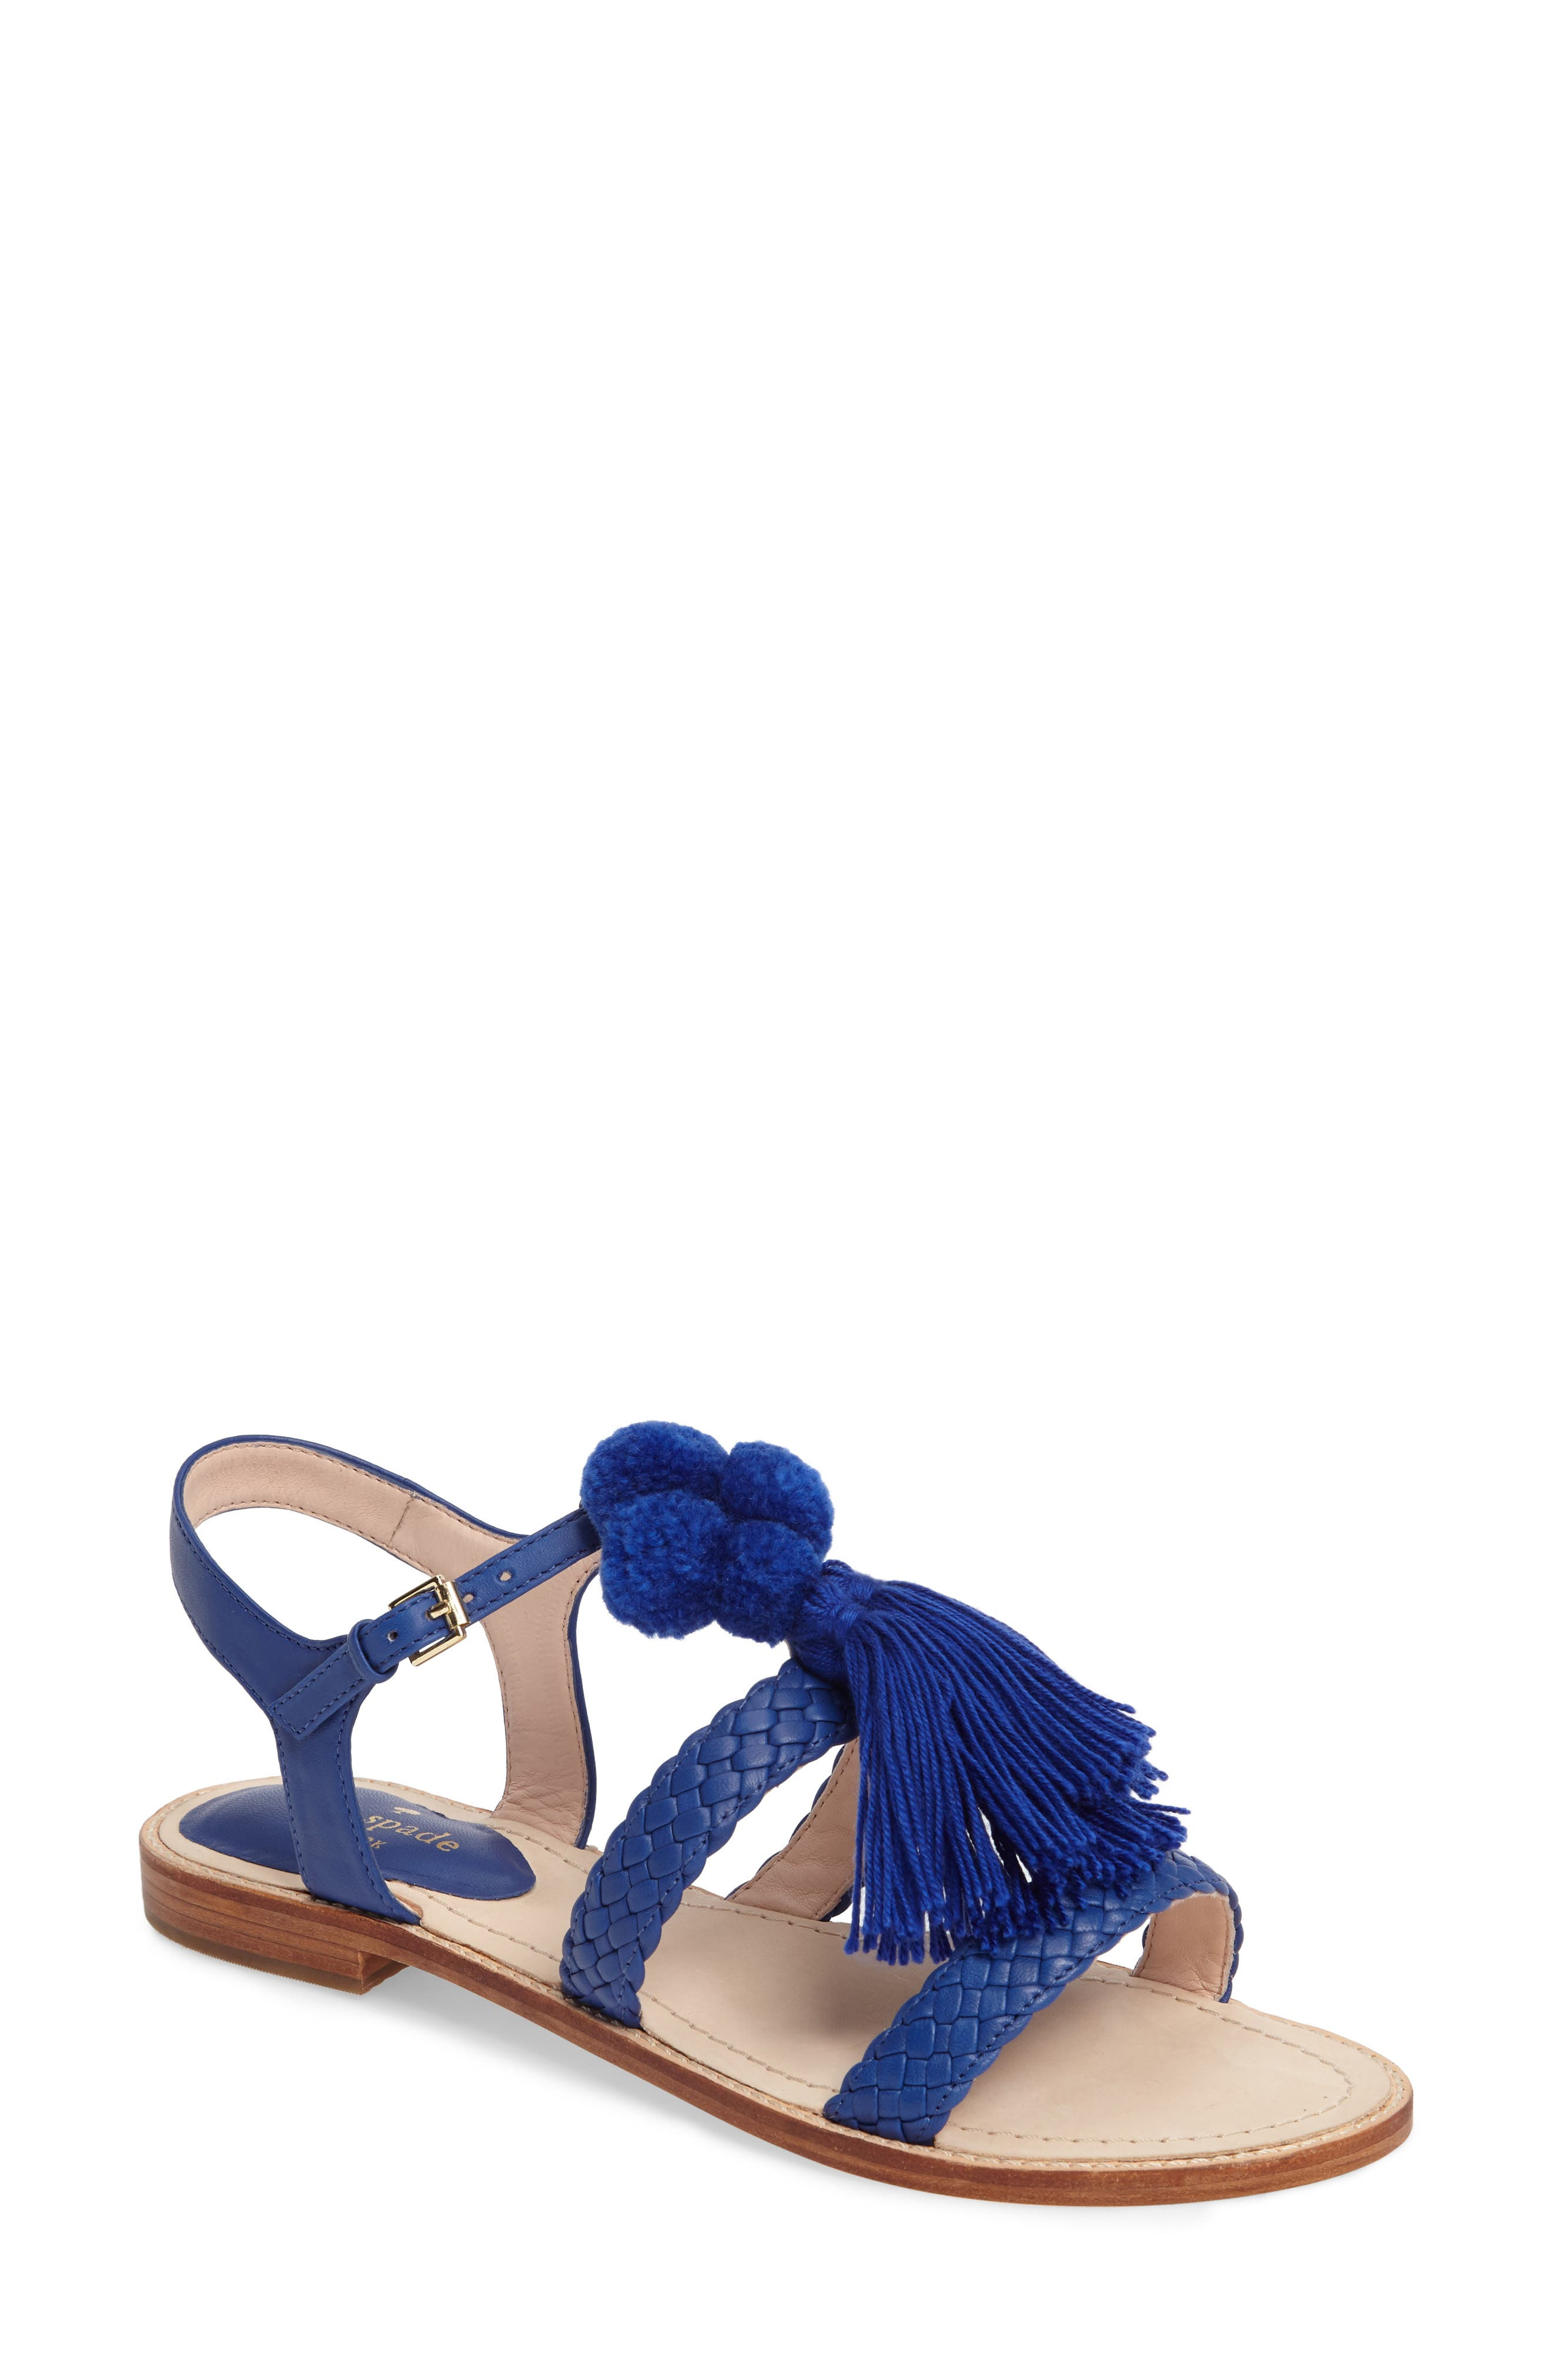 Alternate Image 1 Selected - kate spade new york sunset flat sandal (Women)